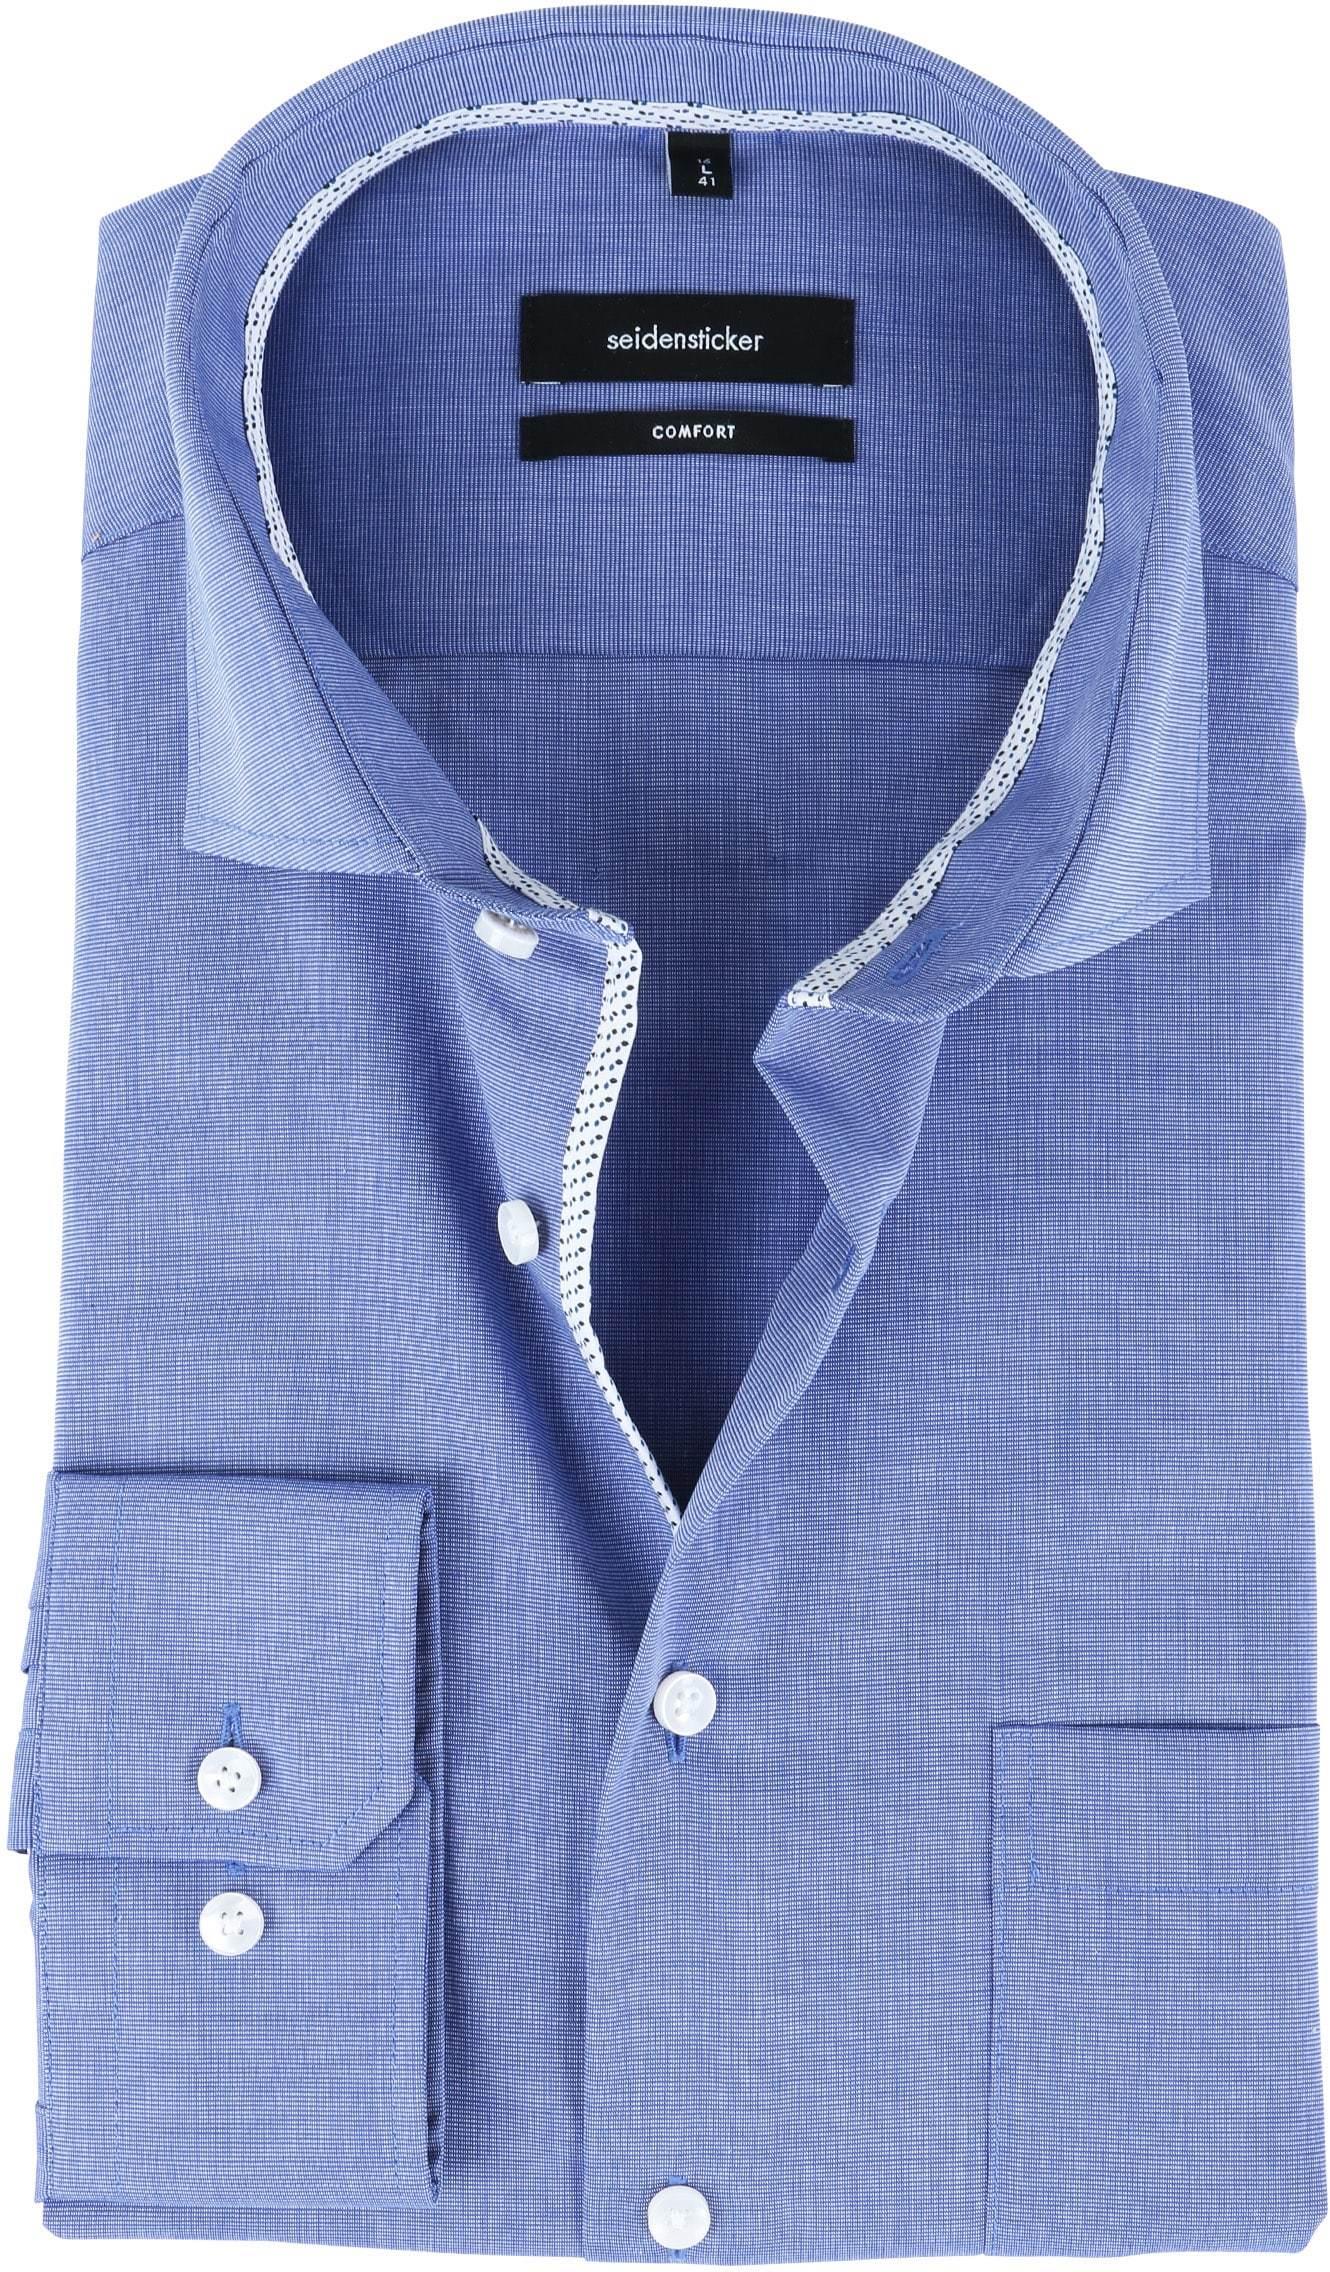 Seidensticker Strijkvrij Overhemd CF Blauw foto 0